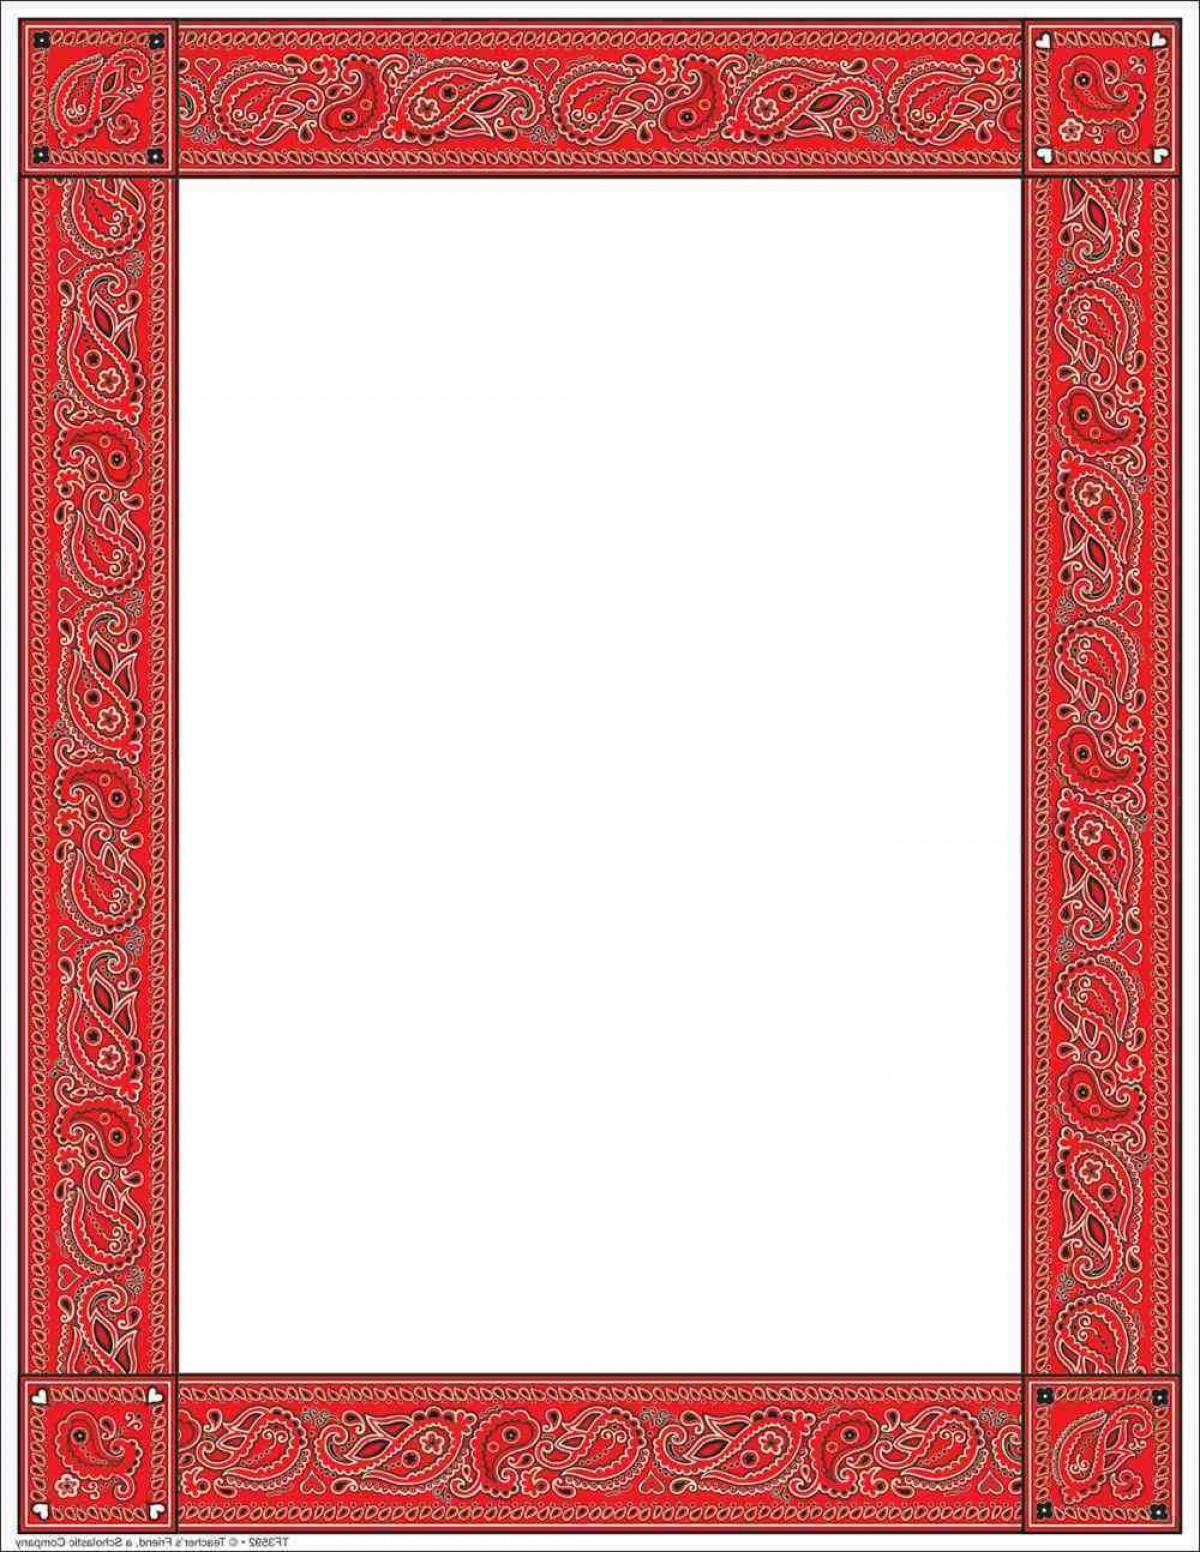 Red Bandana Clipart 56642.